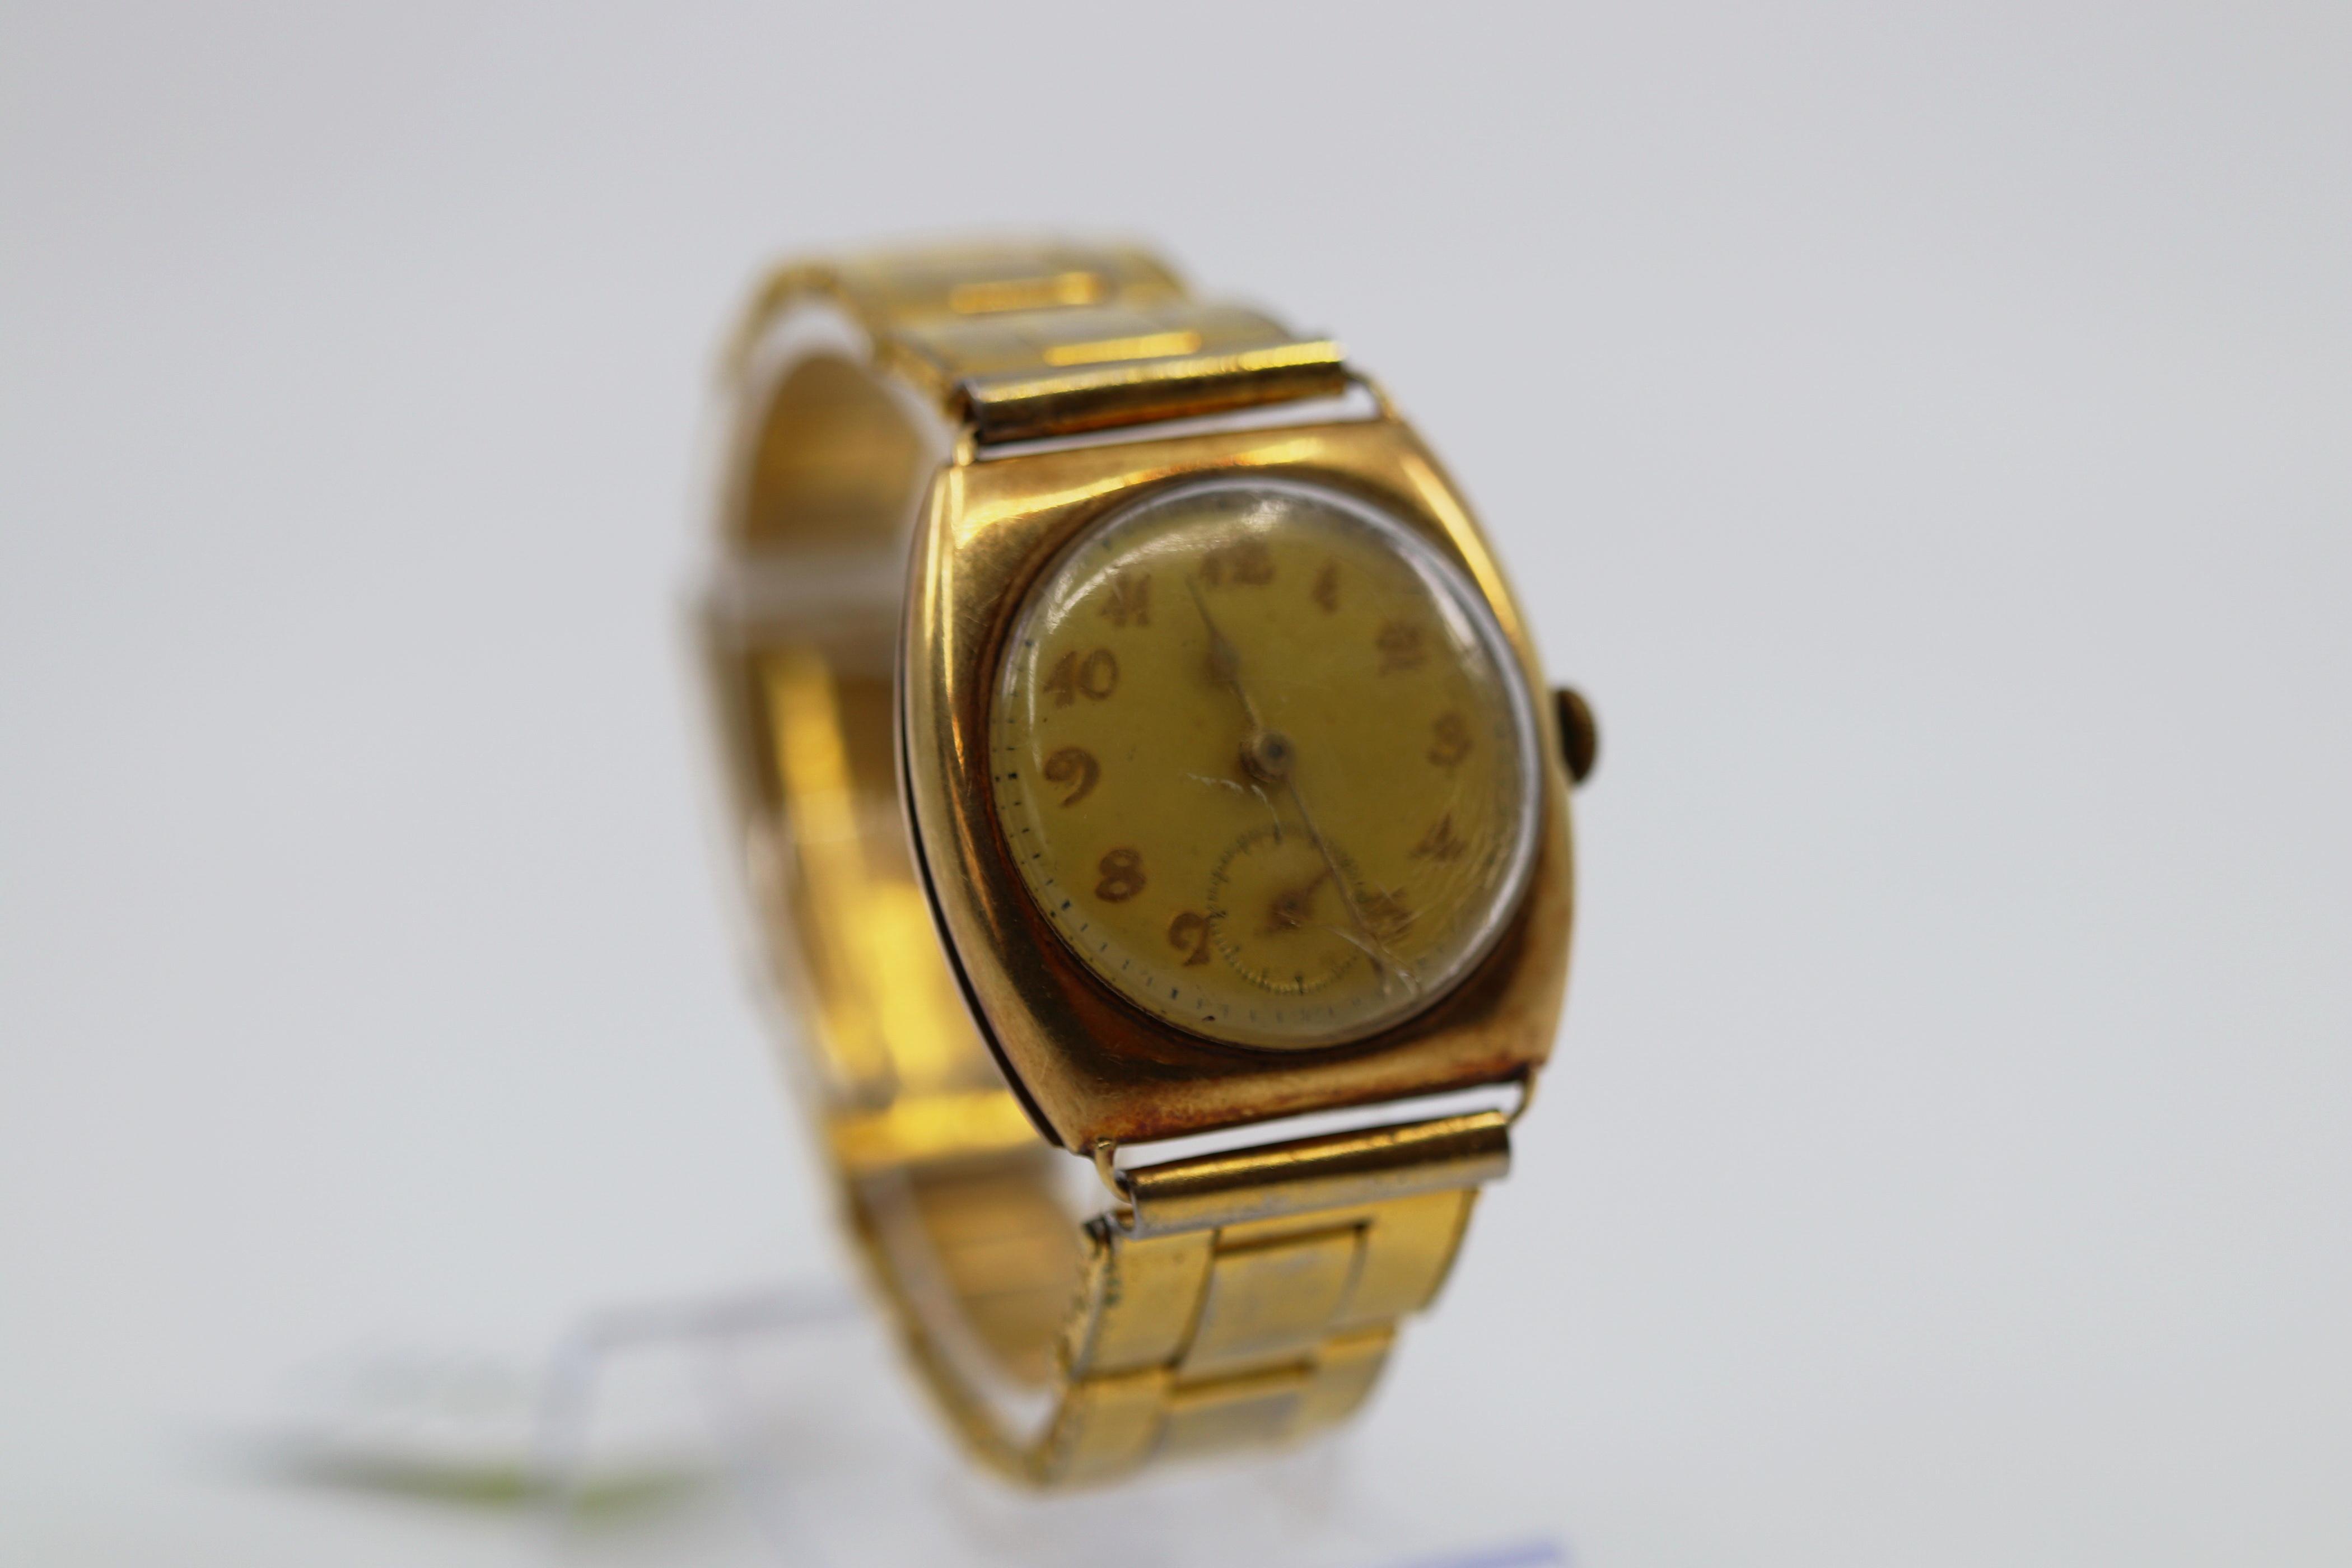 585 MARKED GOLD CASED GENTS WRIST WATCH